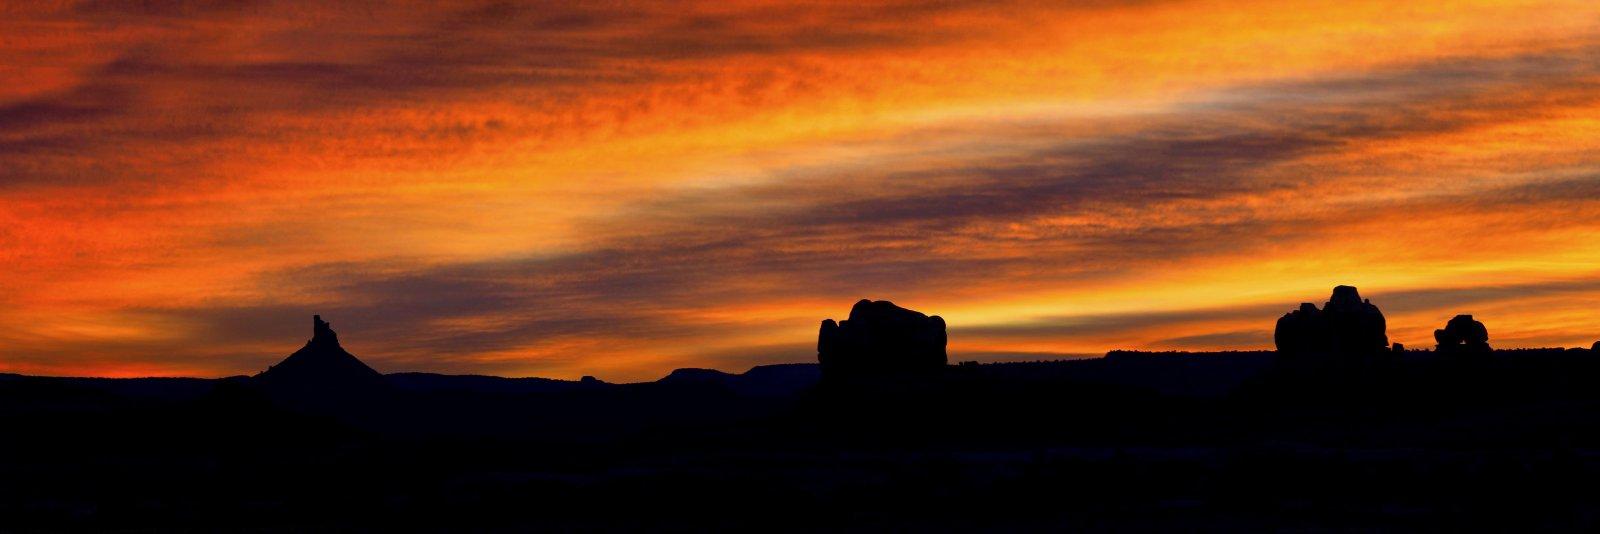 November 12, 2020 Sunrise-jpeg.jpeg